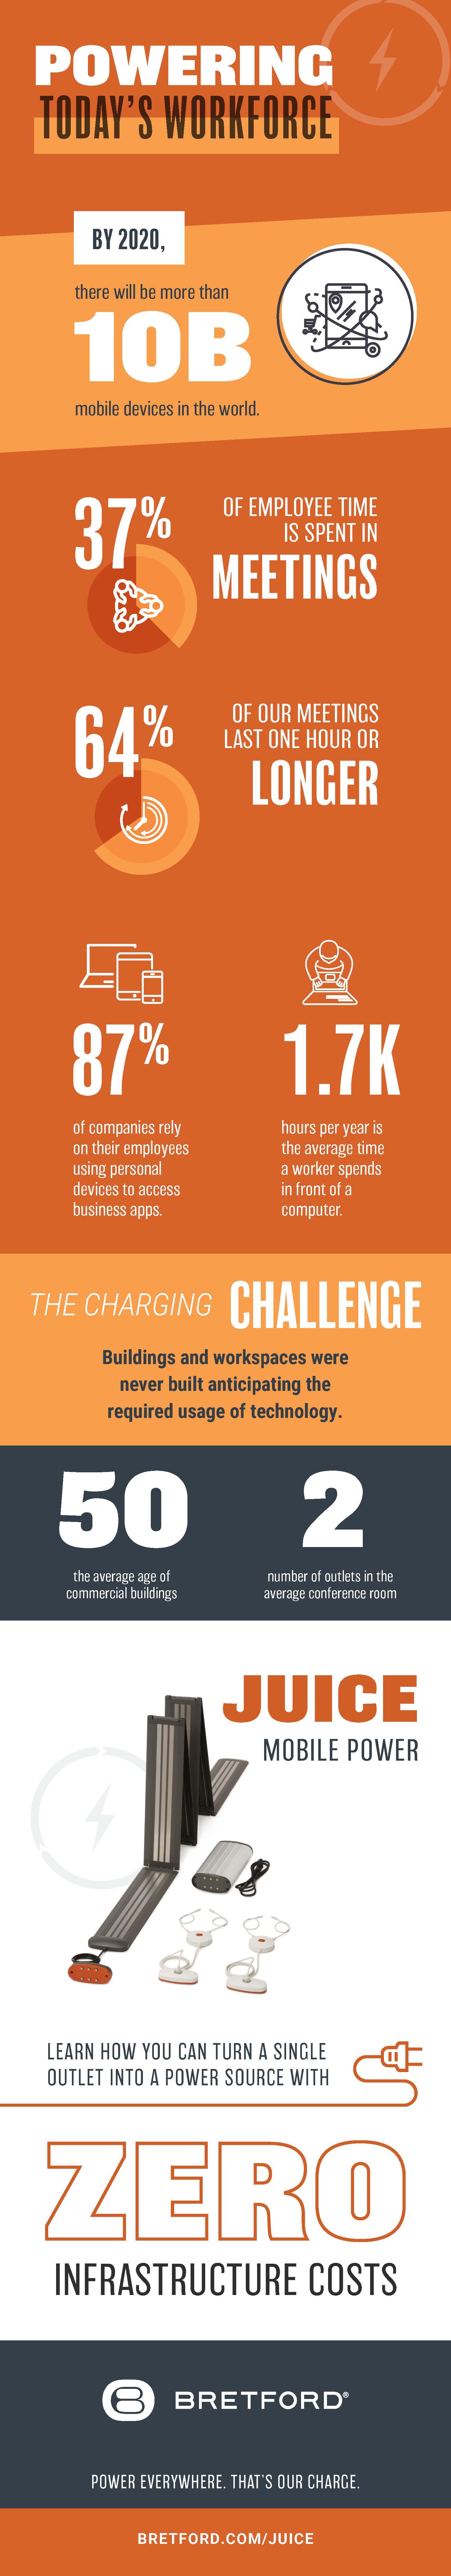 Bretford Infographic - Powering Today's Workforce